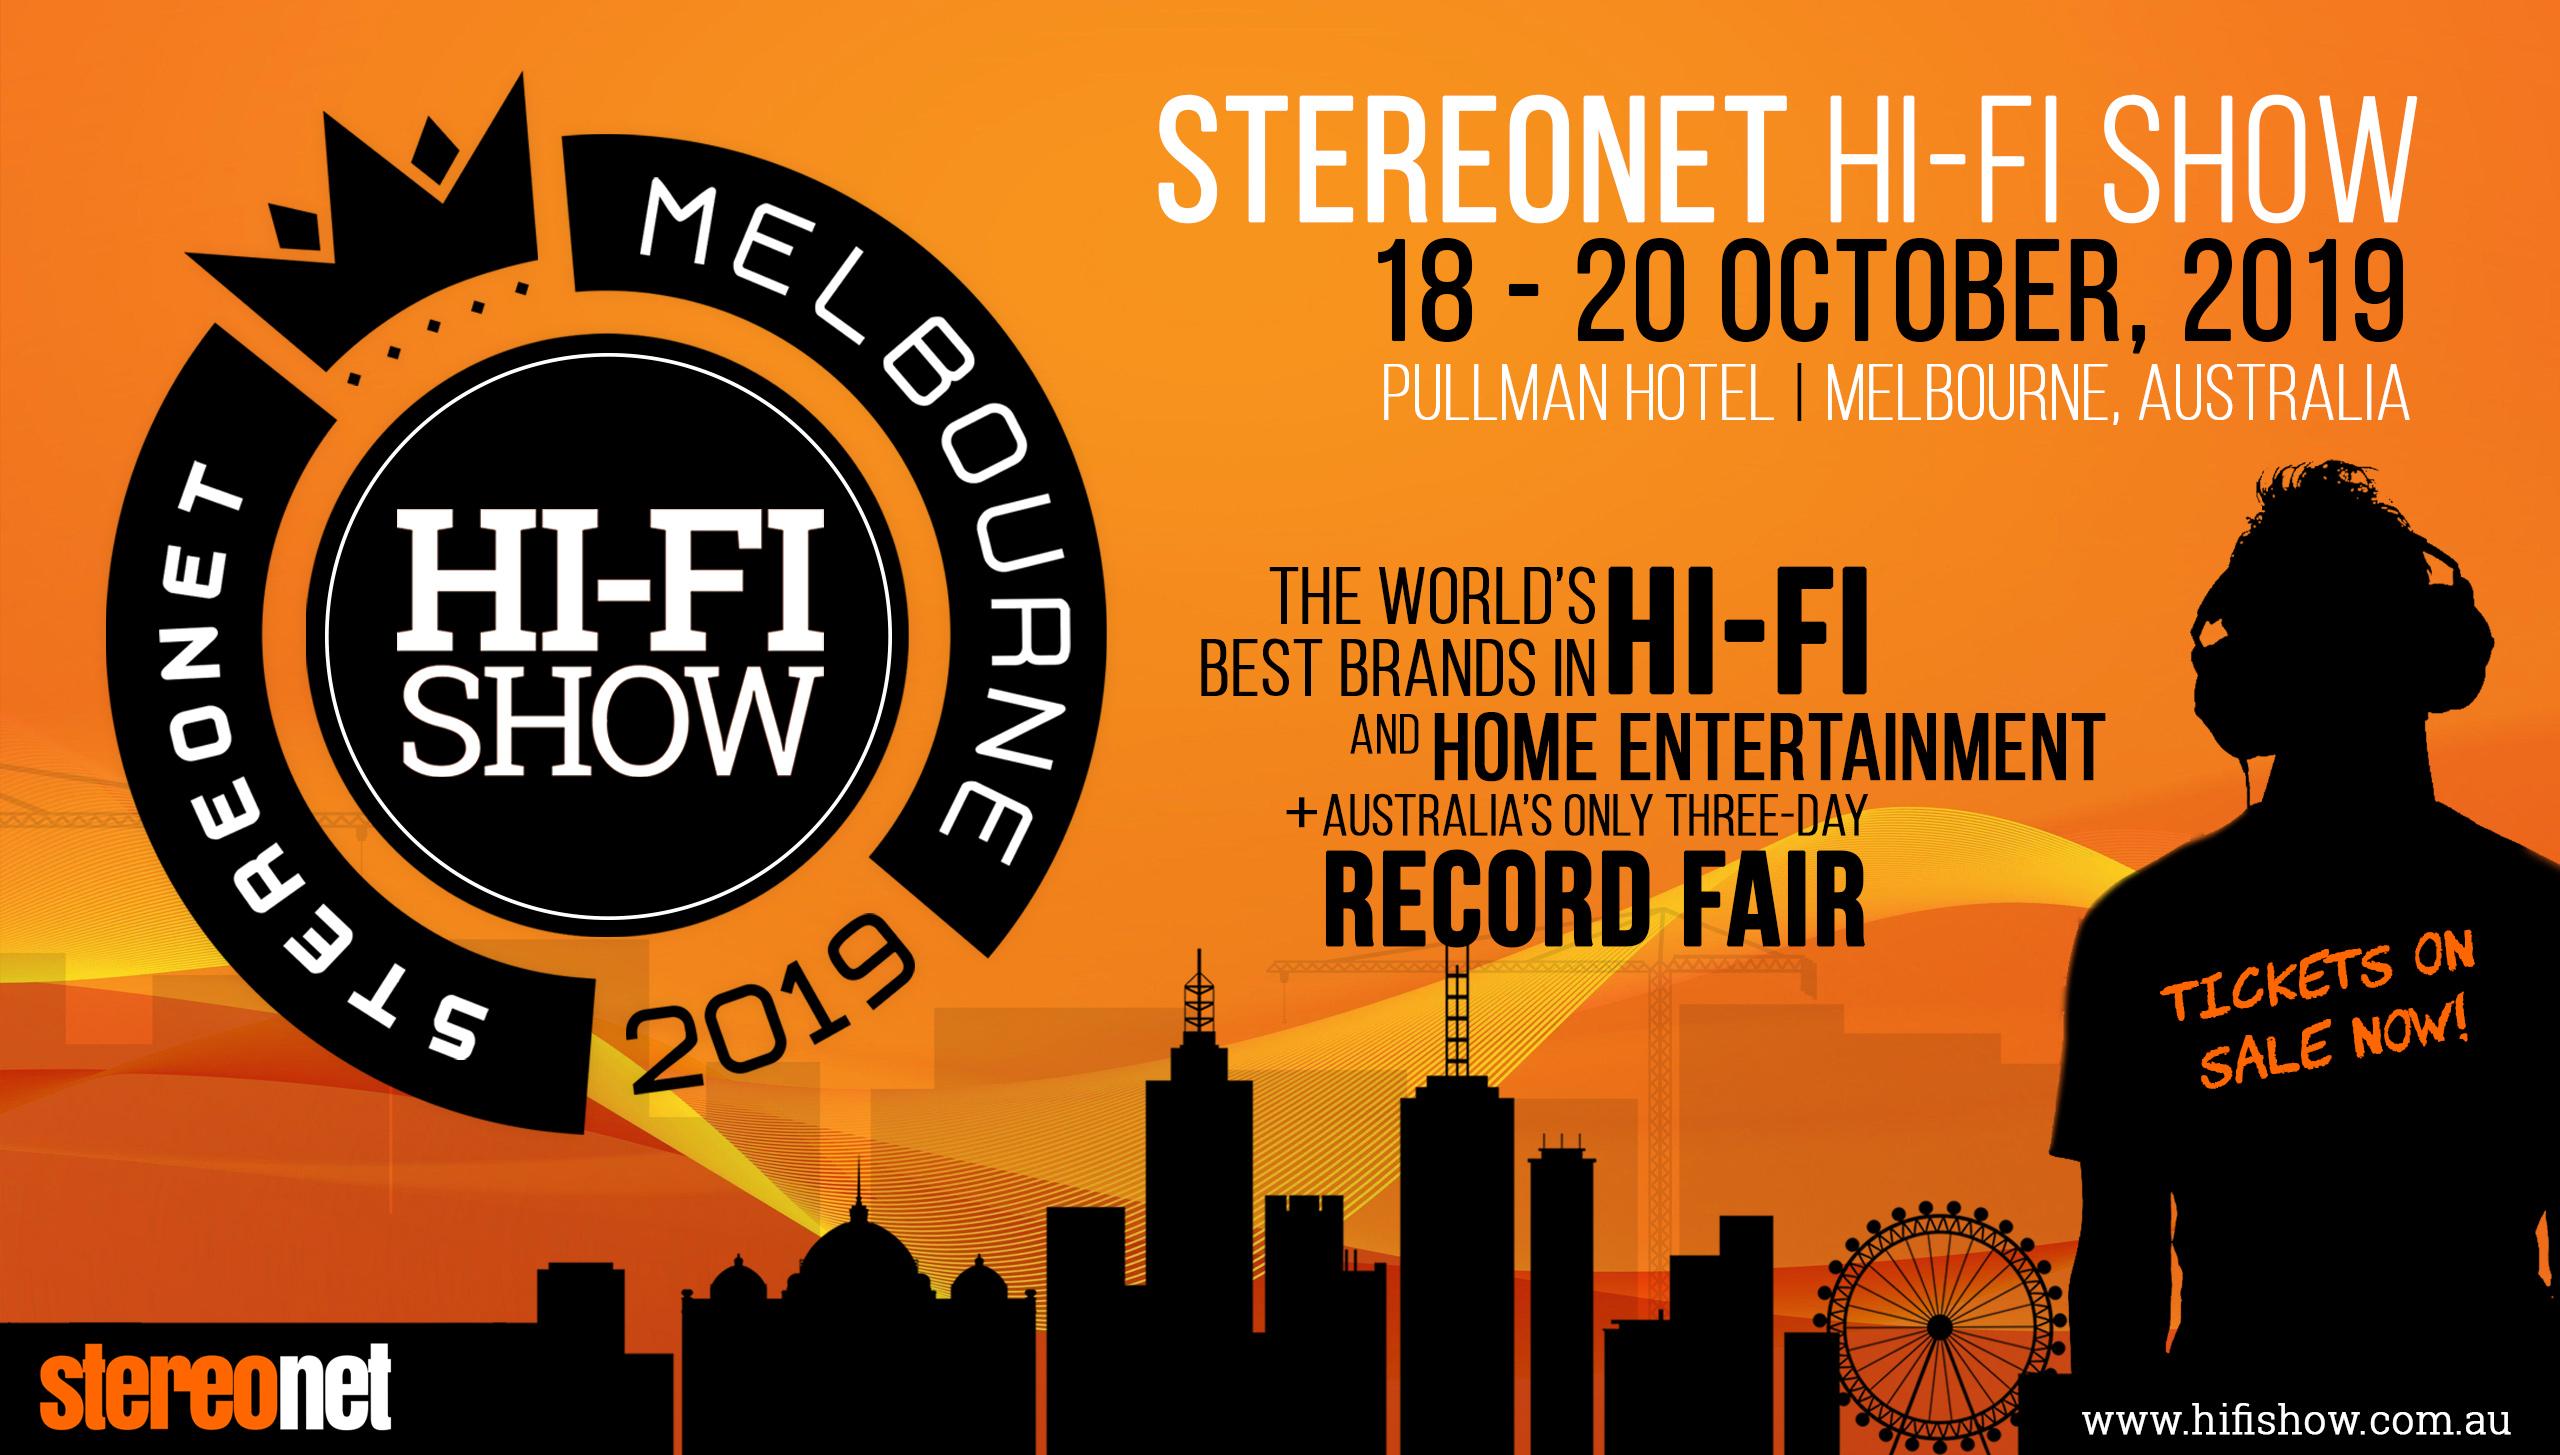 2019 Melbourne StereoNET Hi-FI Show, Pullman Mercure Hotel